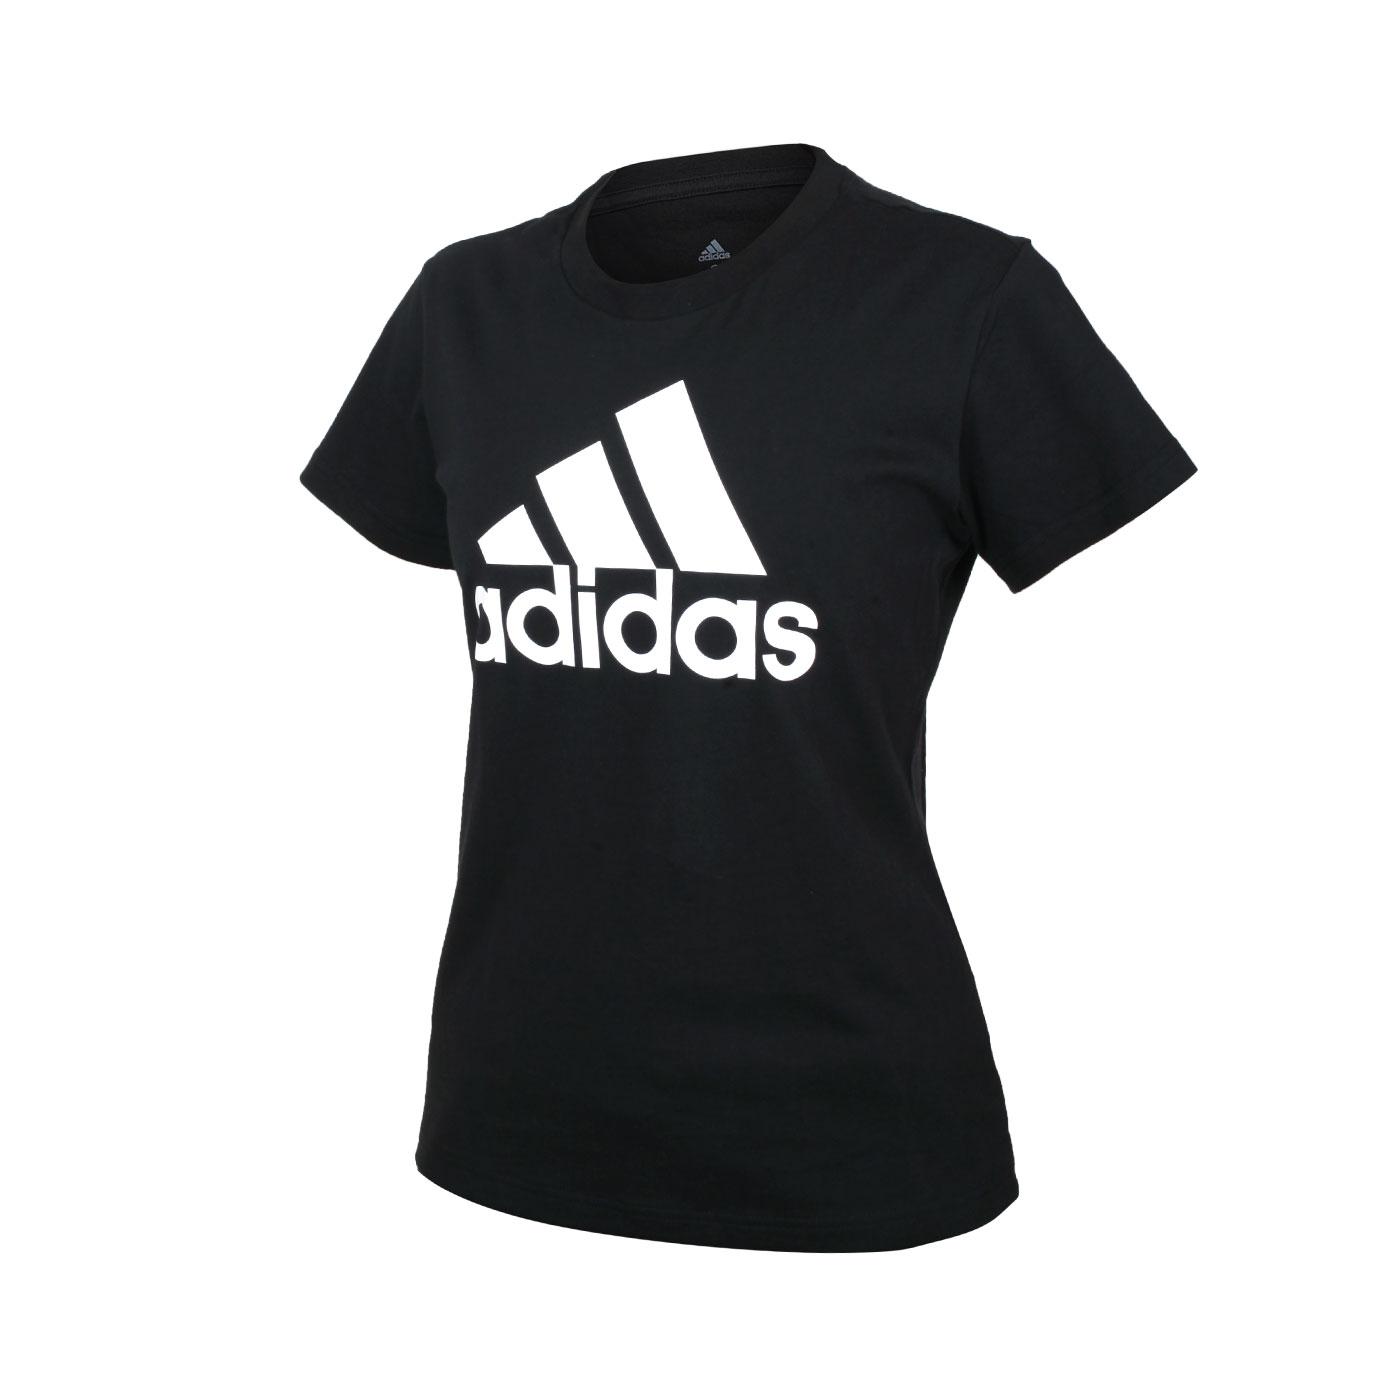 ADIDAS 女款短袖T恤 GL0722 - 黑白